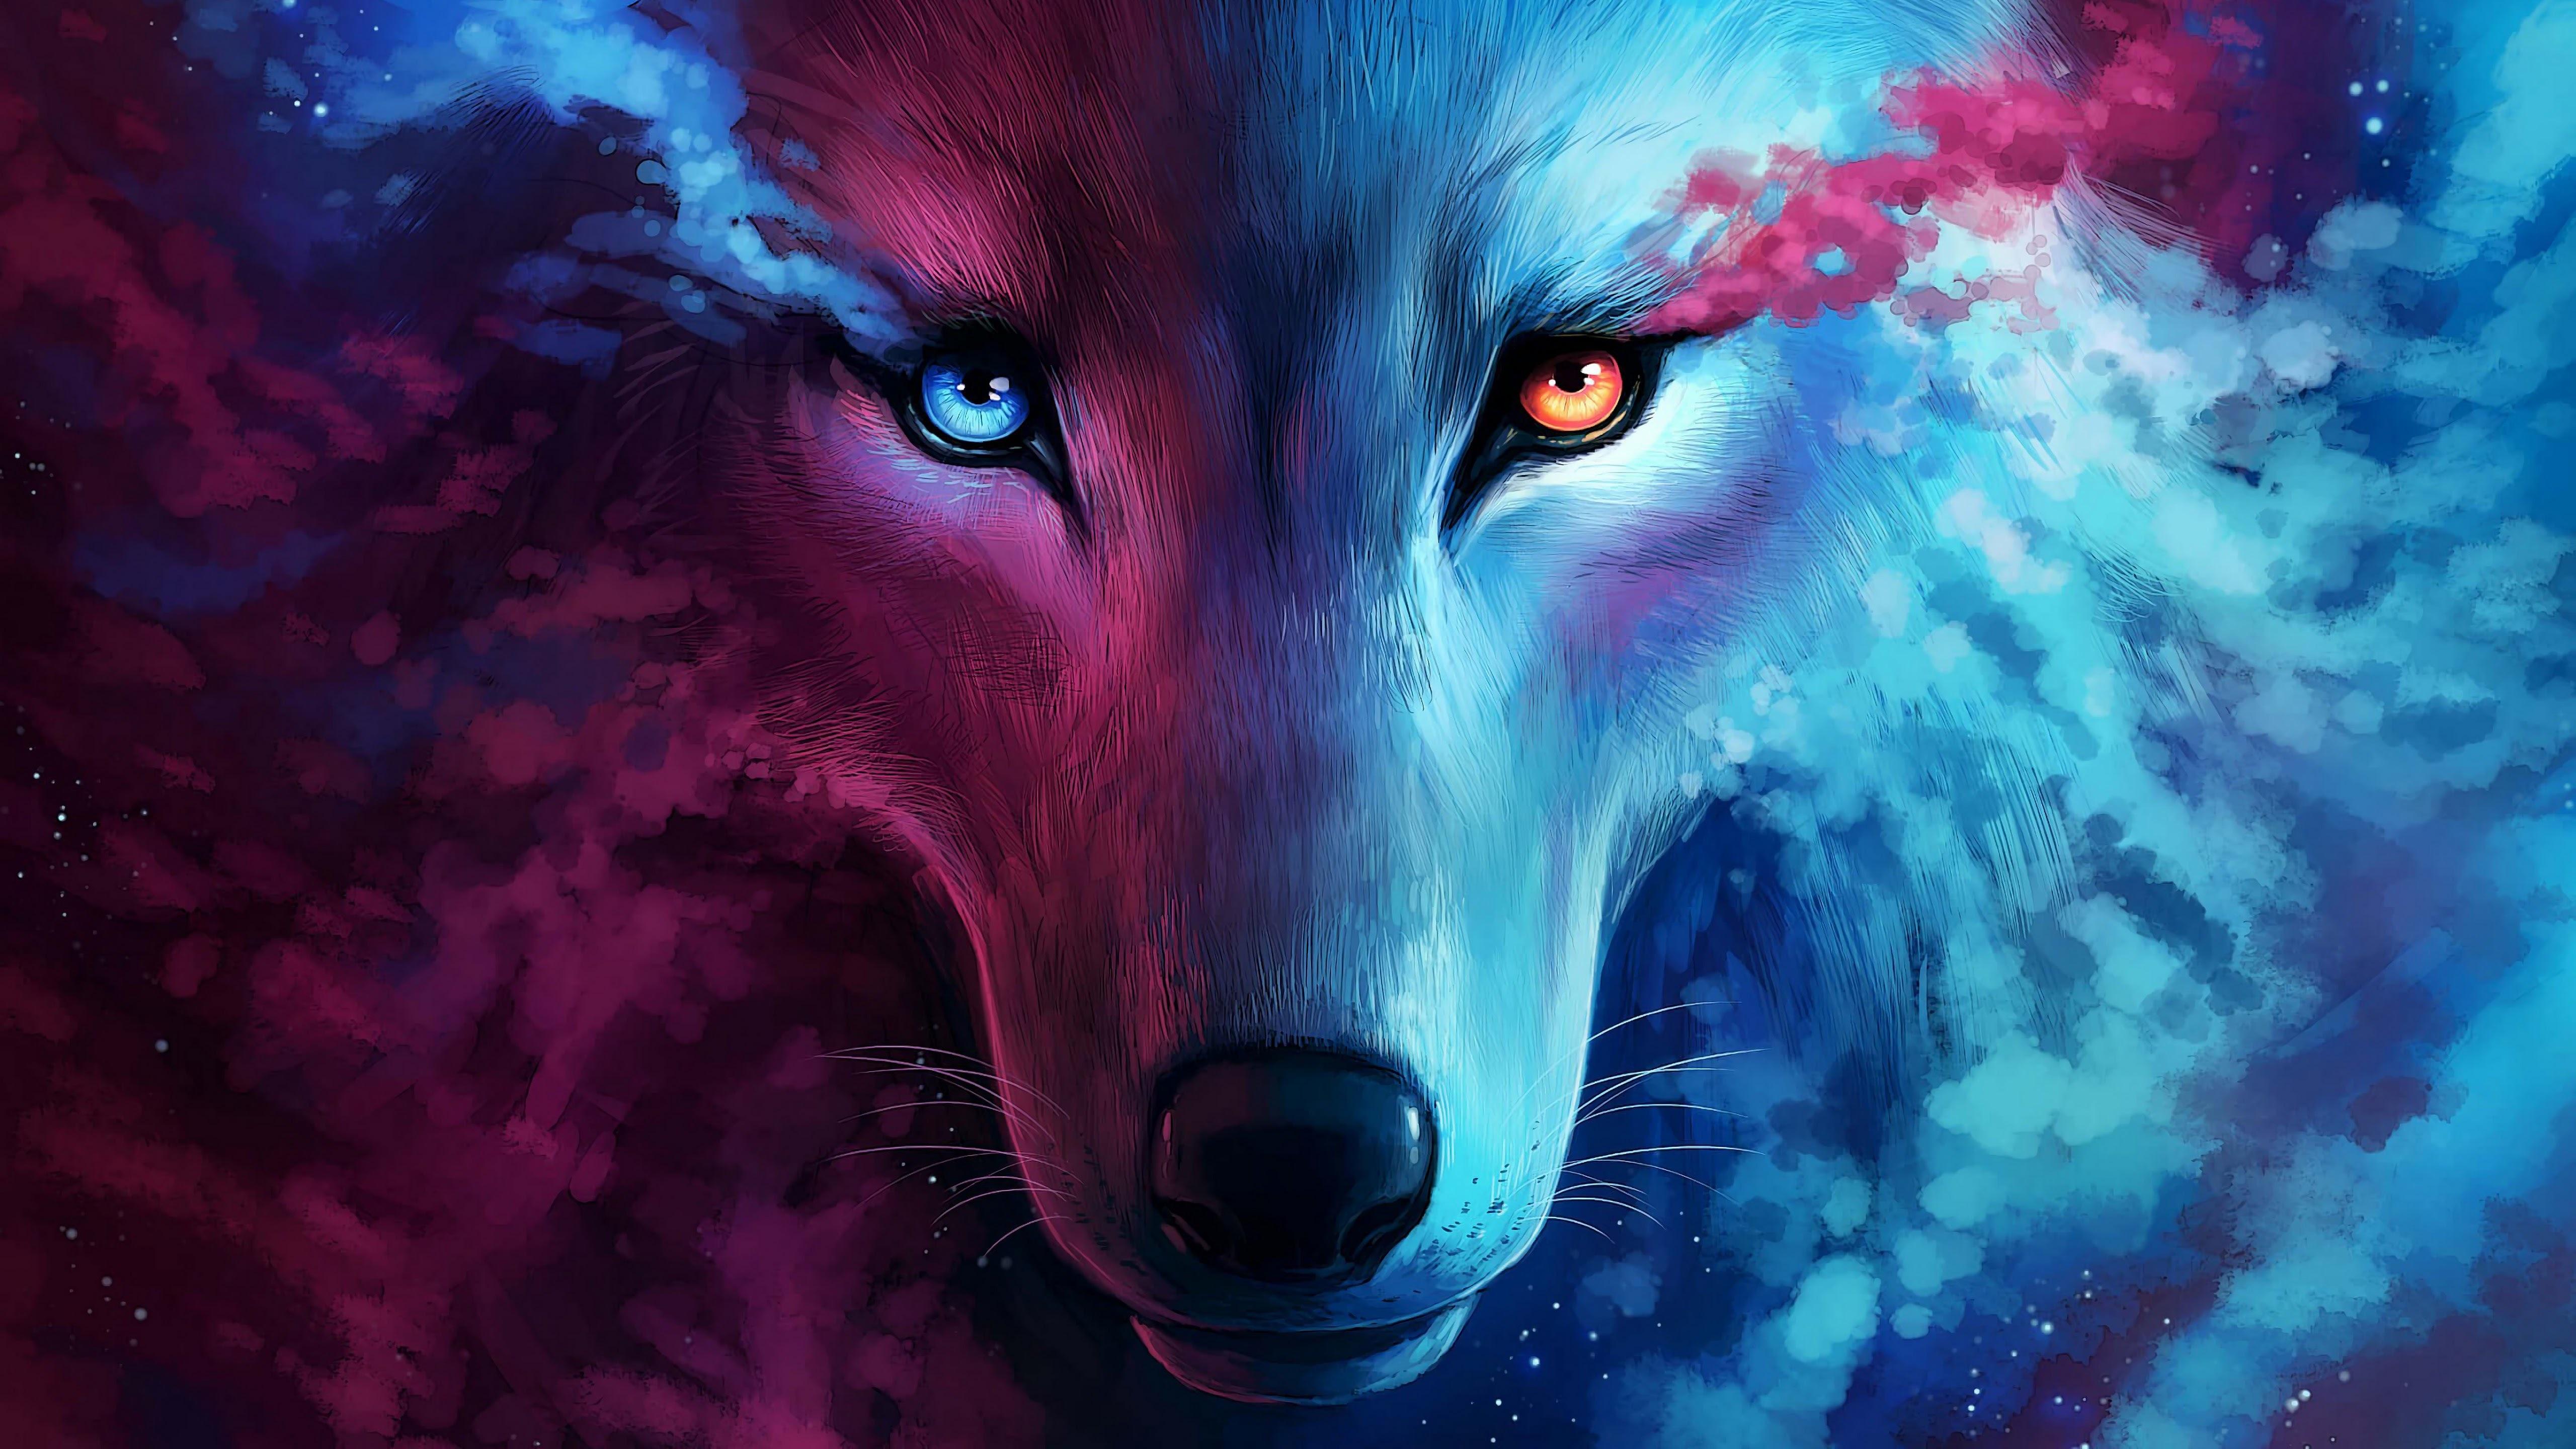 Картинка: Волк, фентези, морда, глаза